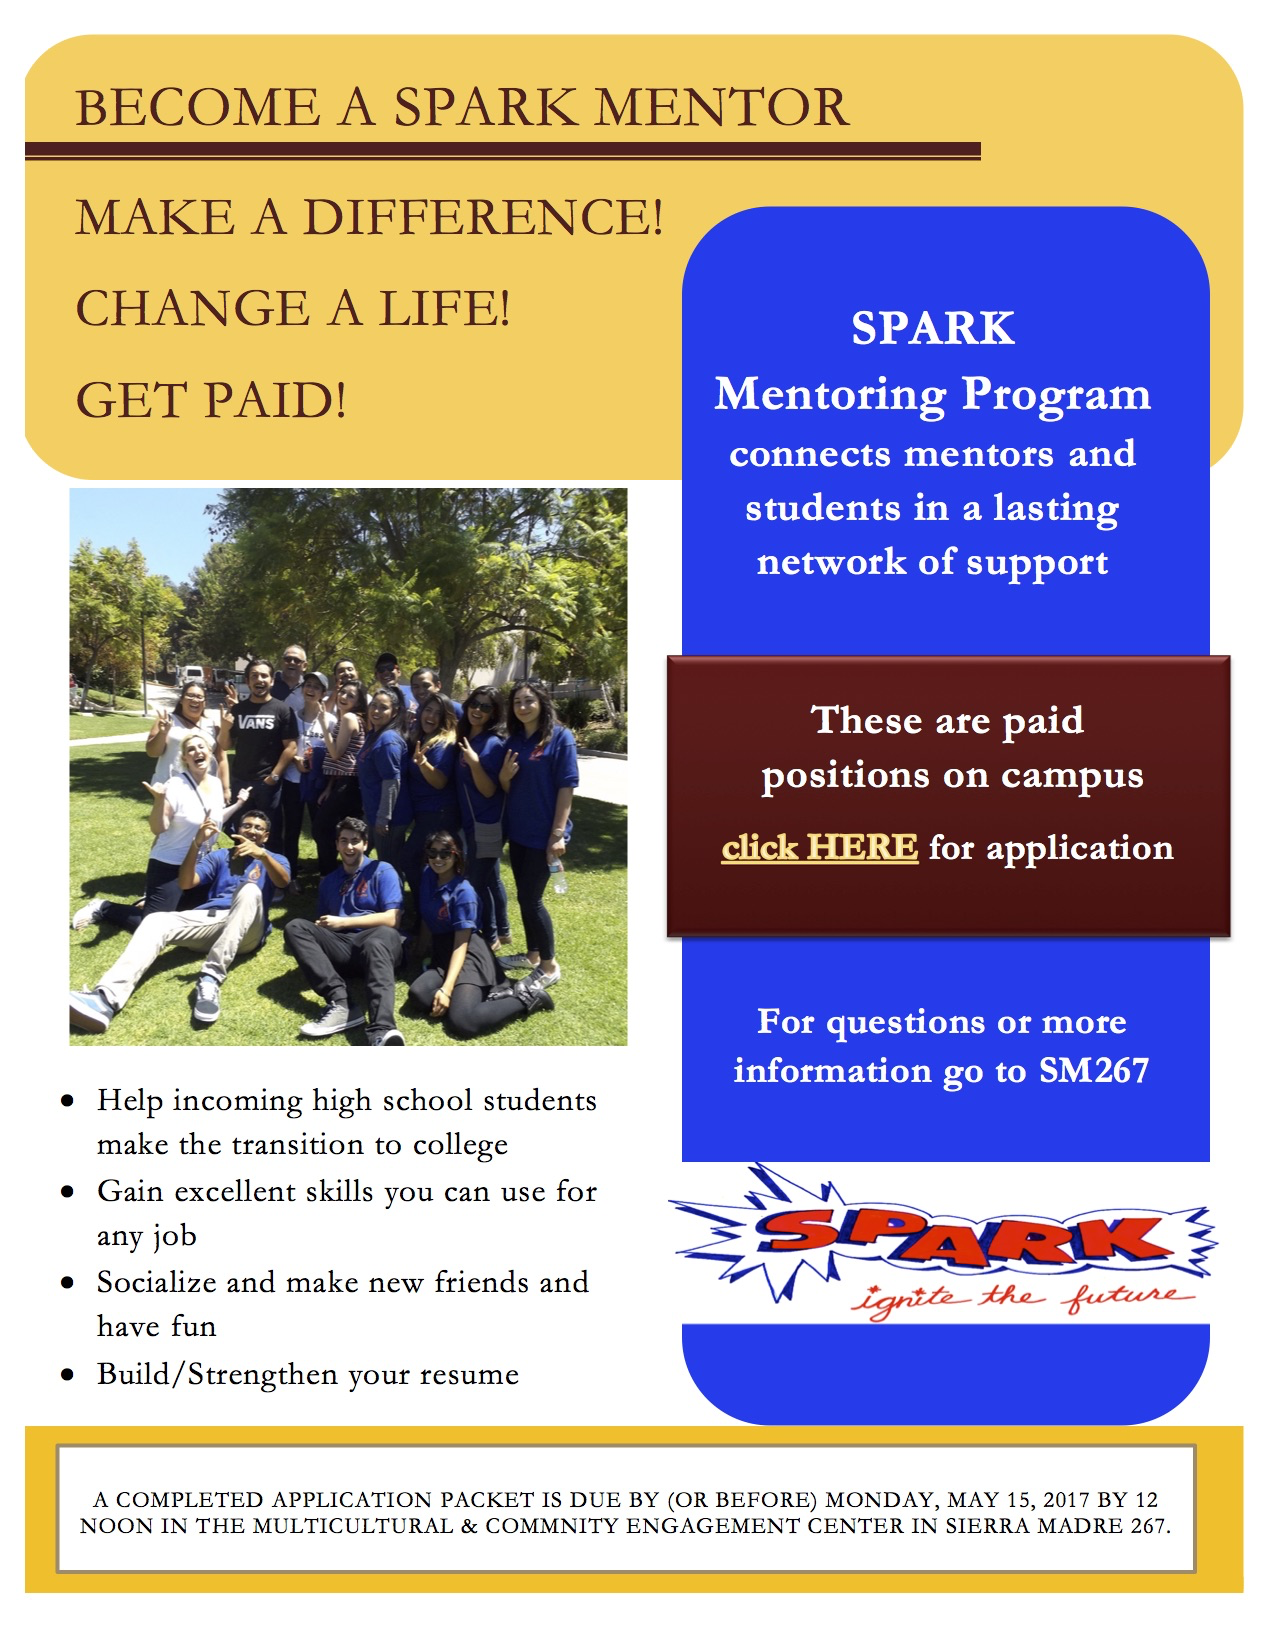 SPARK Mentor Applications Due | GCC Calendar - All events